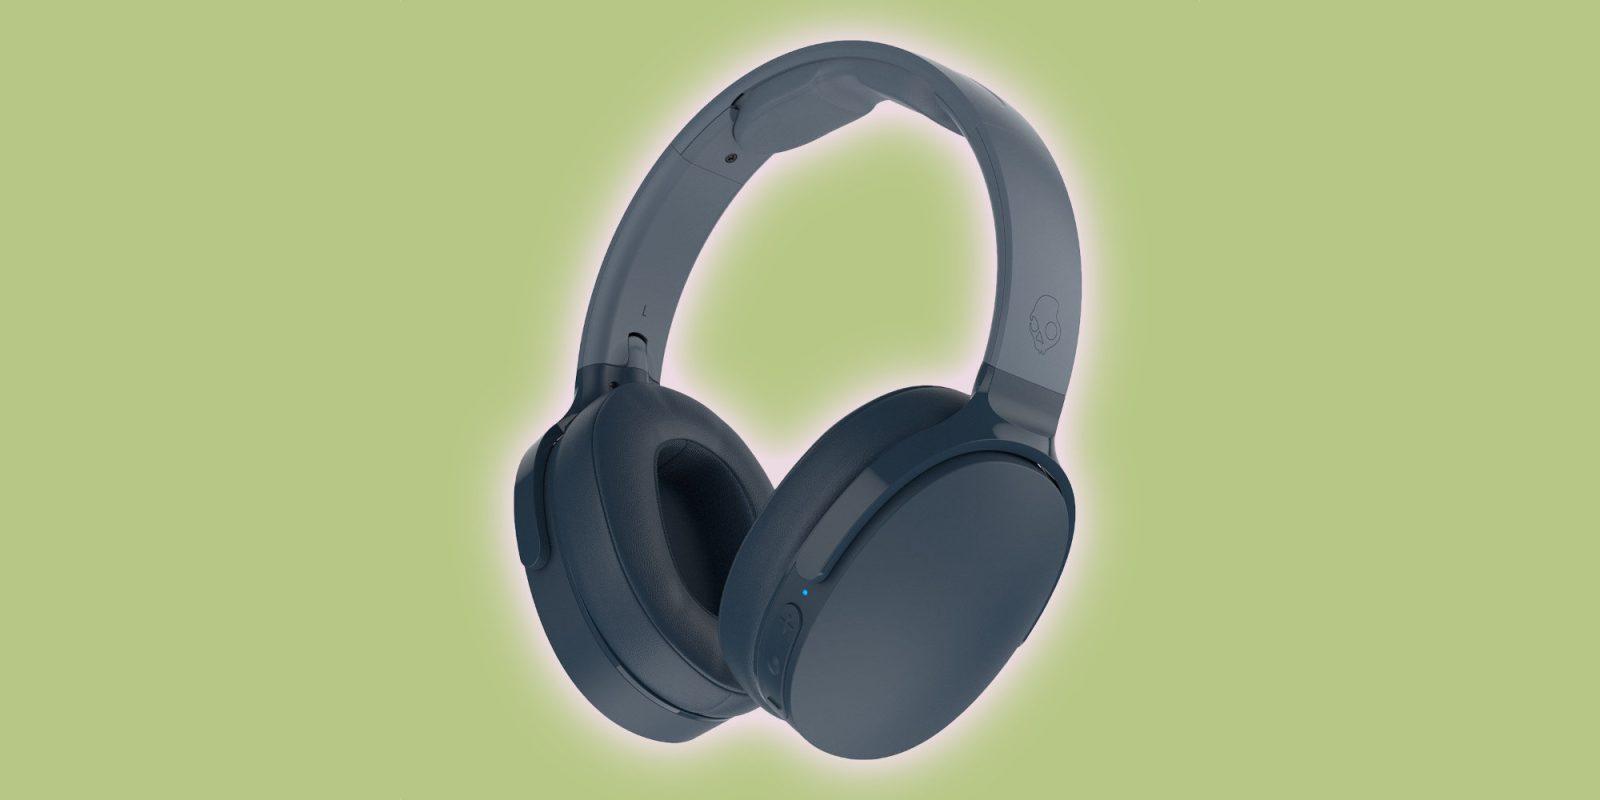 Skullcandy's Hesh 3 Bluetooth Headphones hit $60 at Amazon (Reg. up to $100)